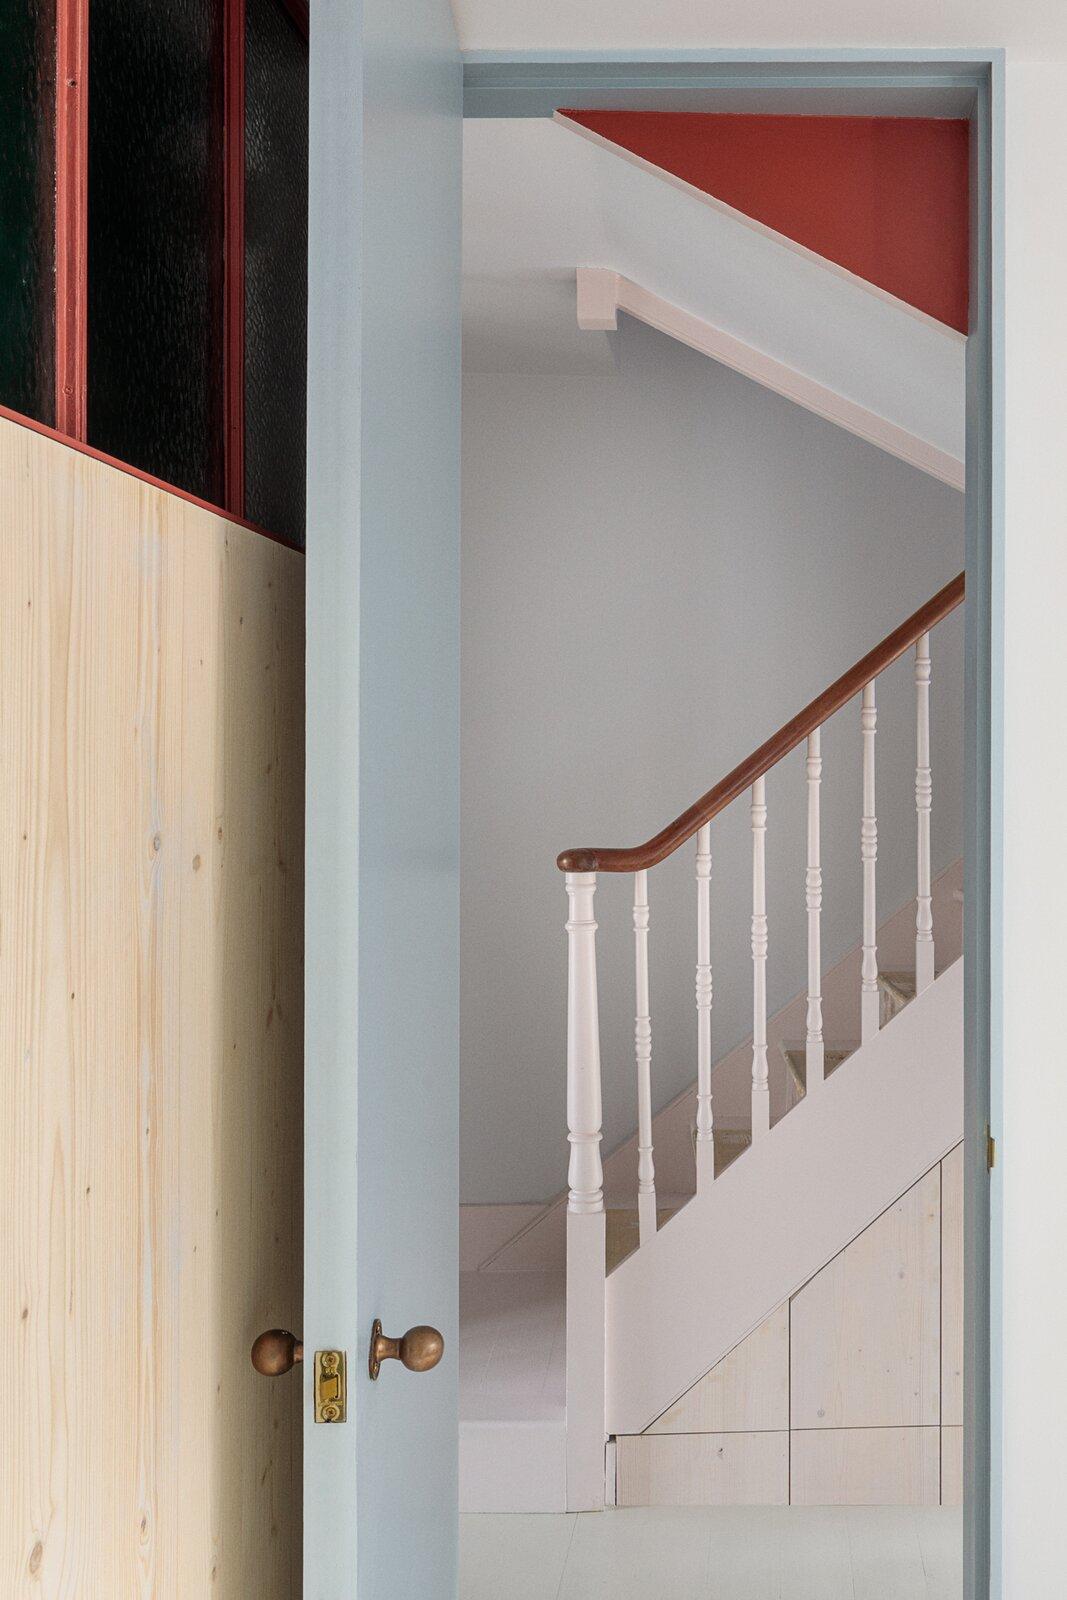 Bedroom and Medium Hardwood Floor Looking from the childrens' bedroom towards the hallway  Primrose Hill